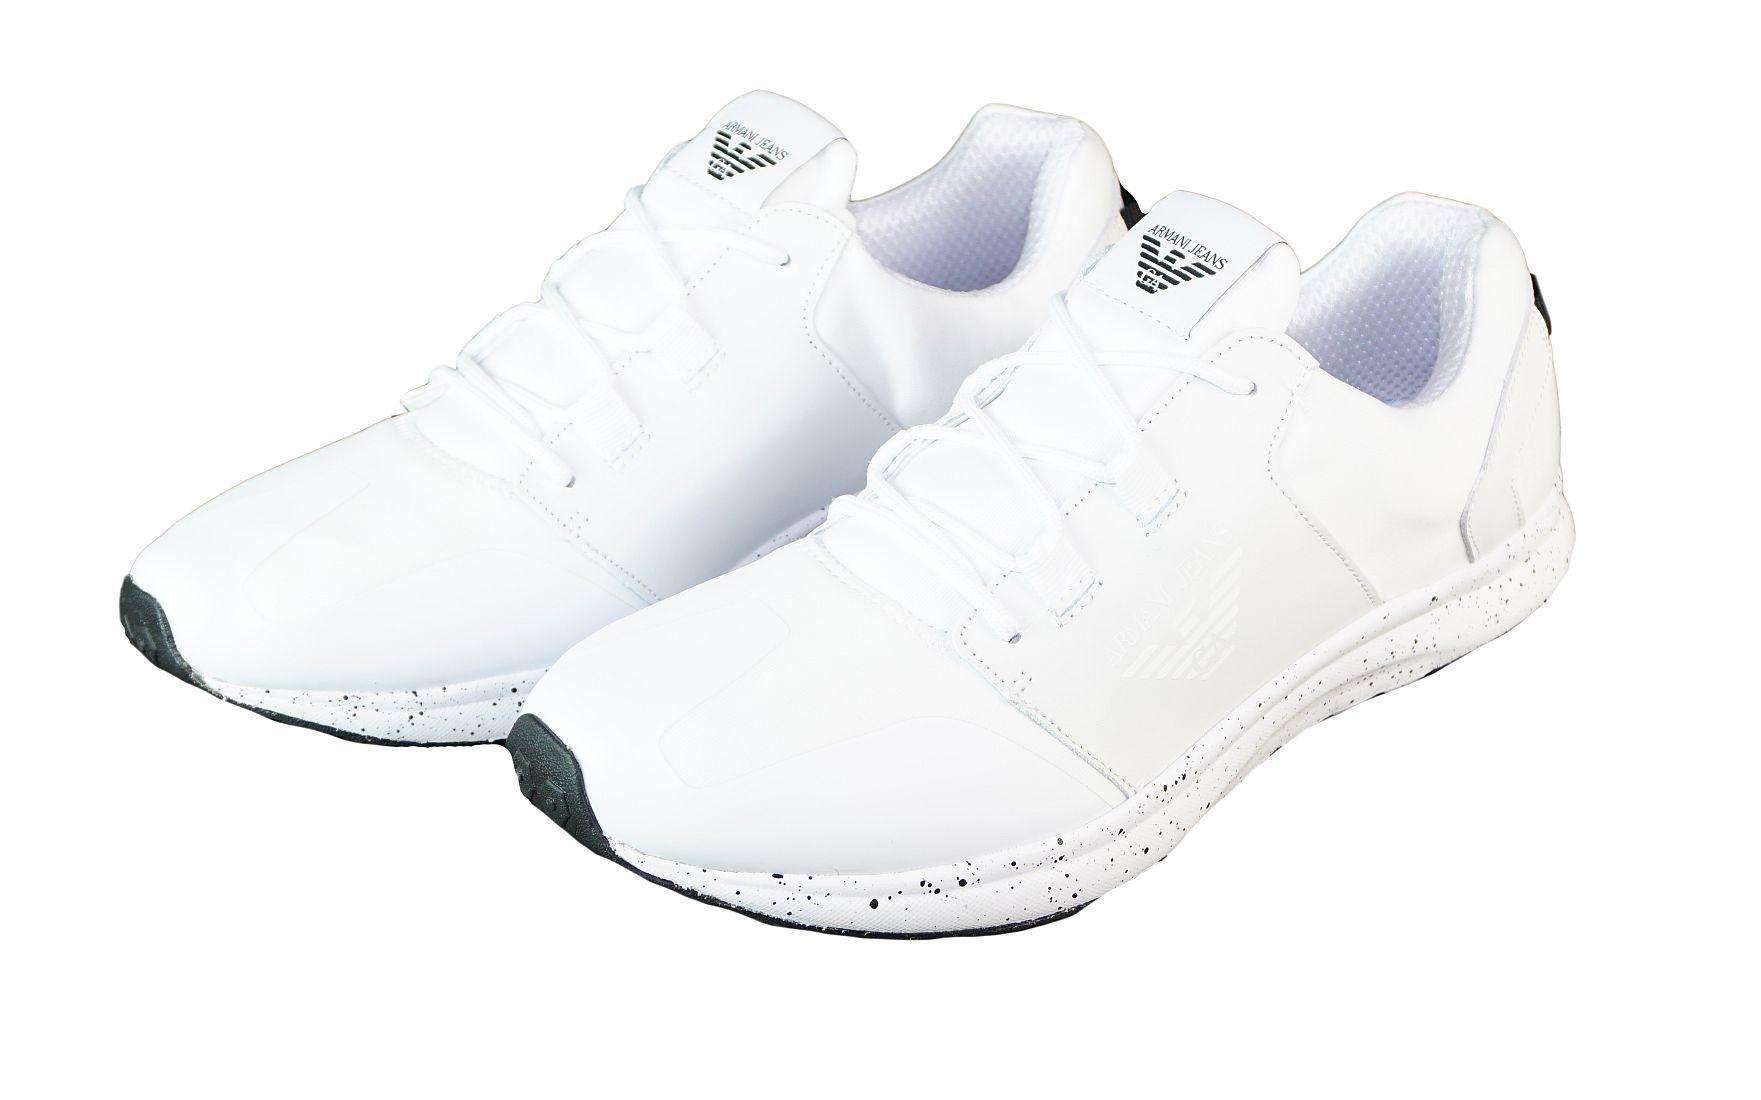 Armani Jeans Schnürschuhe Sneaker Low Cut 935037 7P416 00010 Bianco weiss S17-AJS1